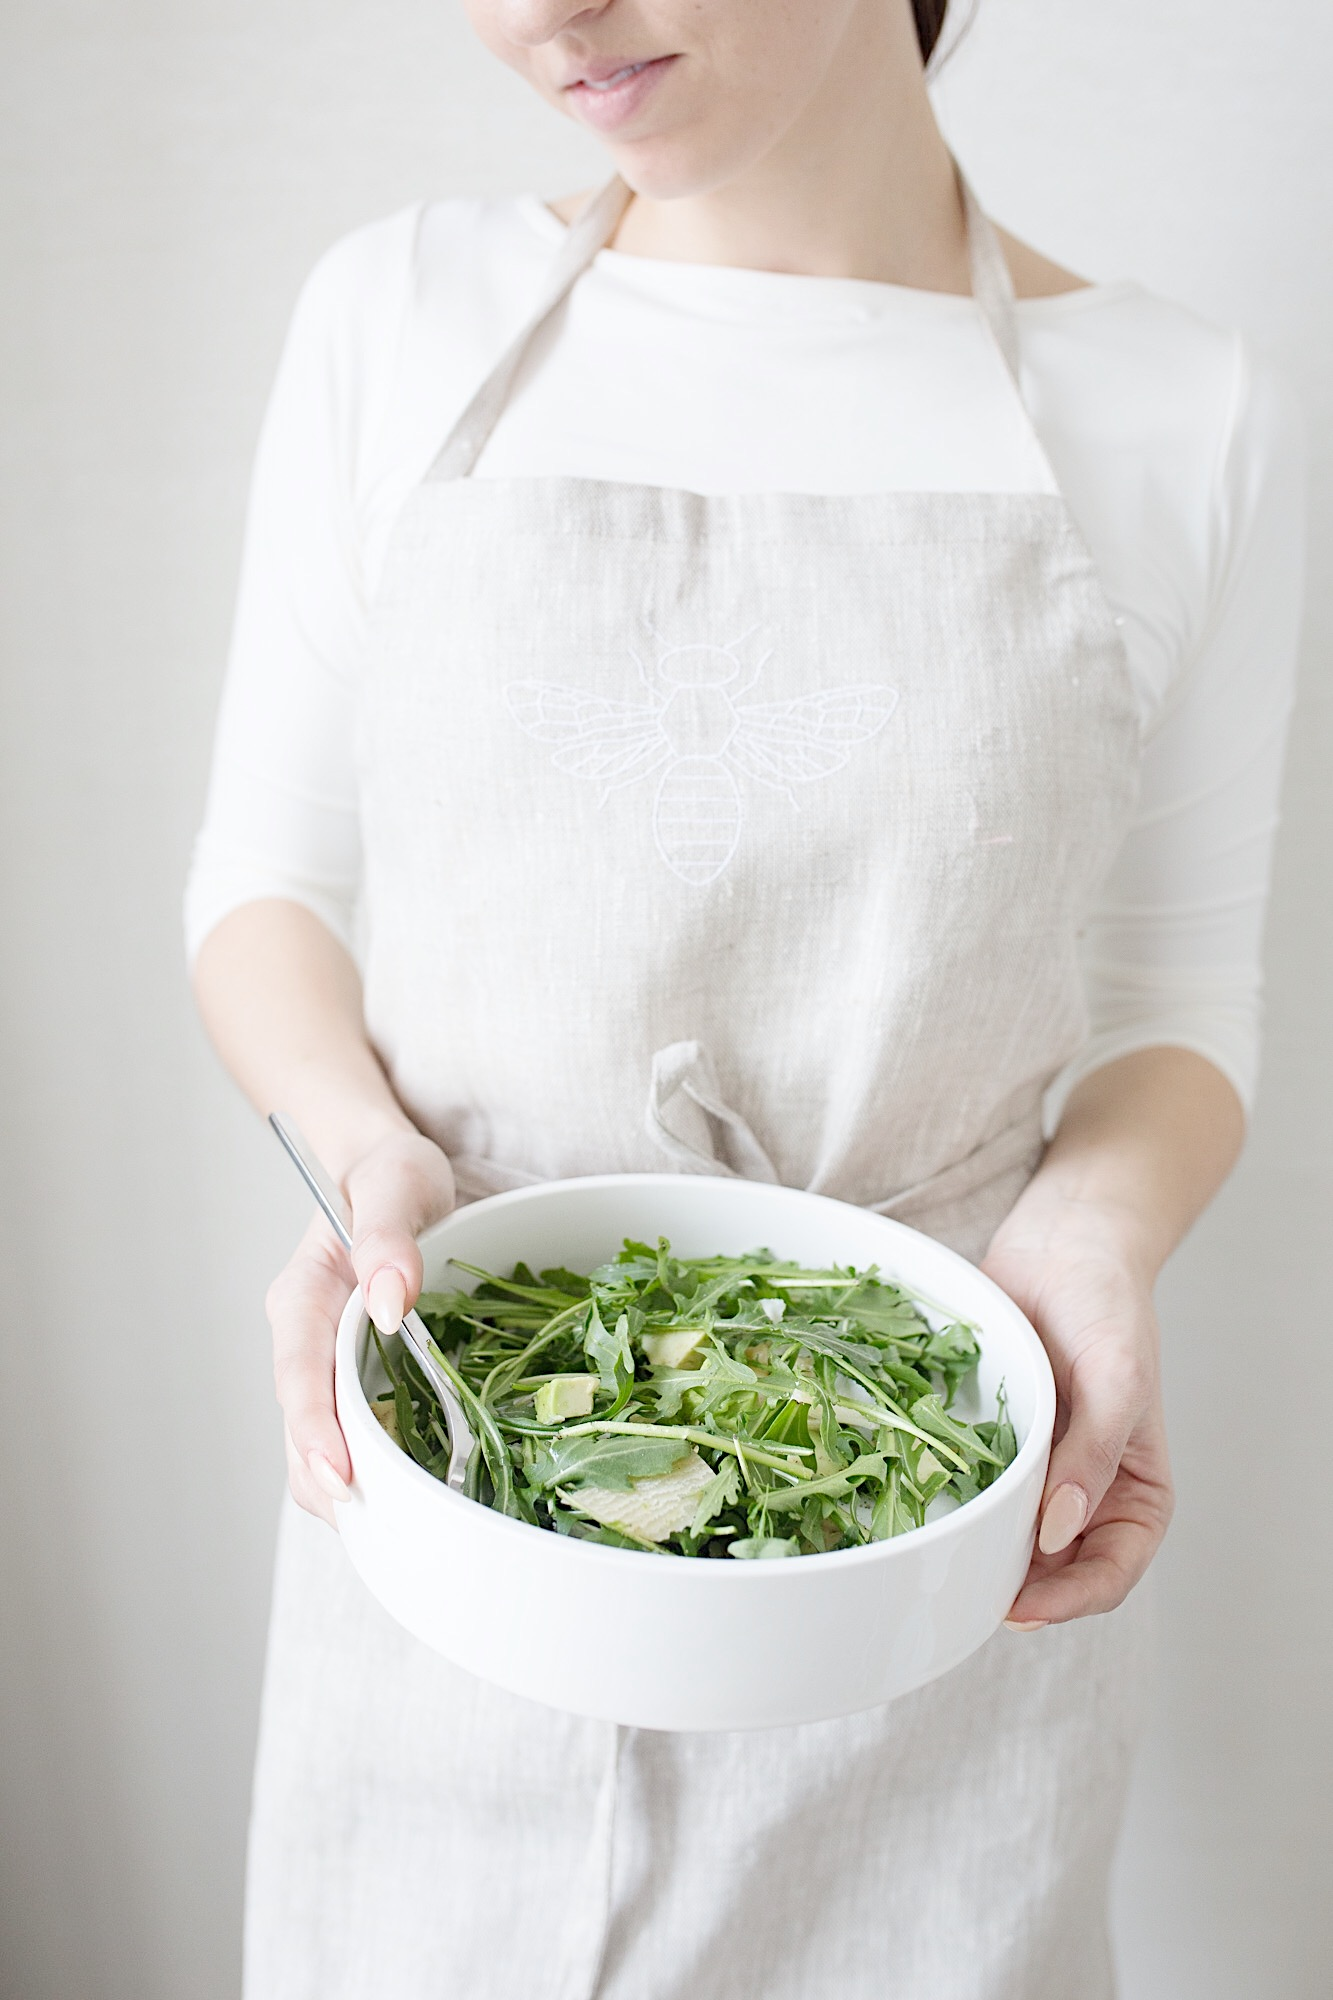 Nordic Honey_Arugula Salad with Avocado, Parmesan and Lime & Honey Dressing_Prep.jpg